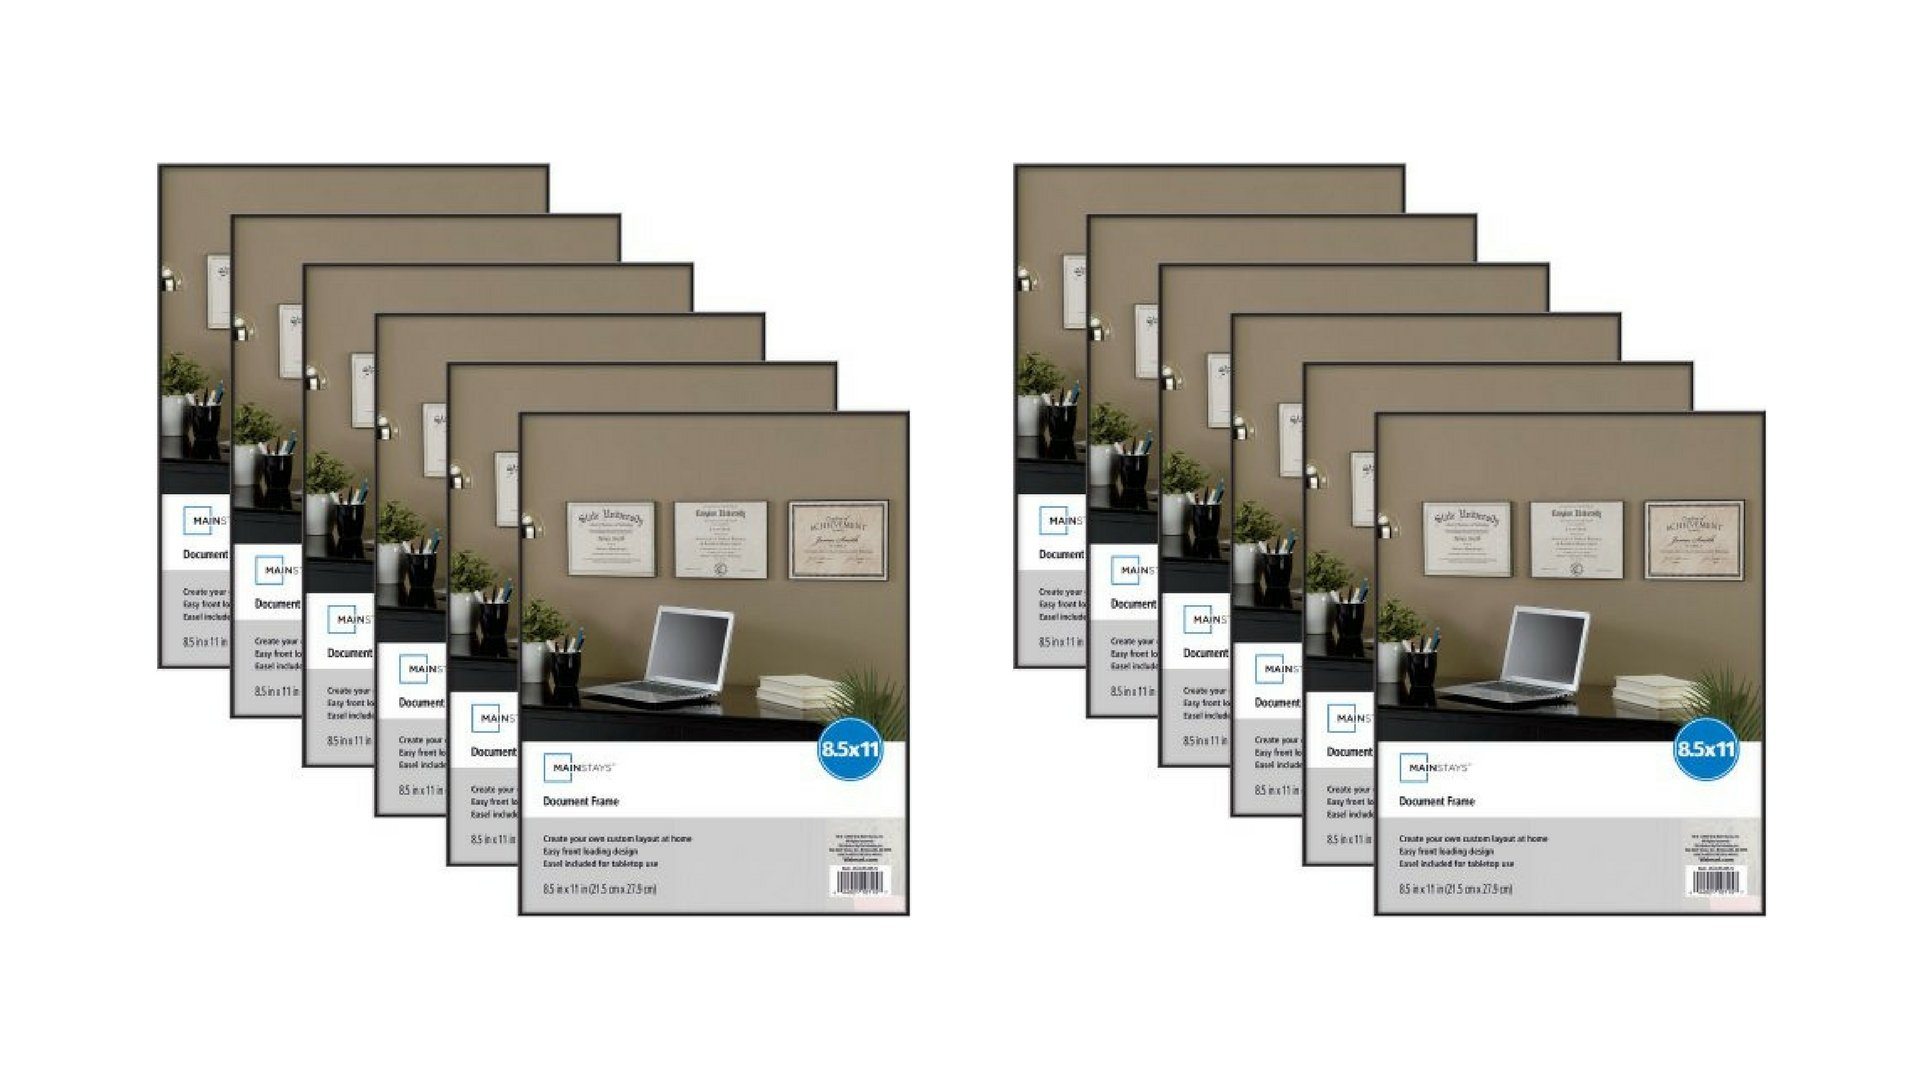 Mainstays 8.5x11 Black Core Mats Document Format Picture Frame, 12-Pieces